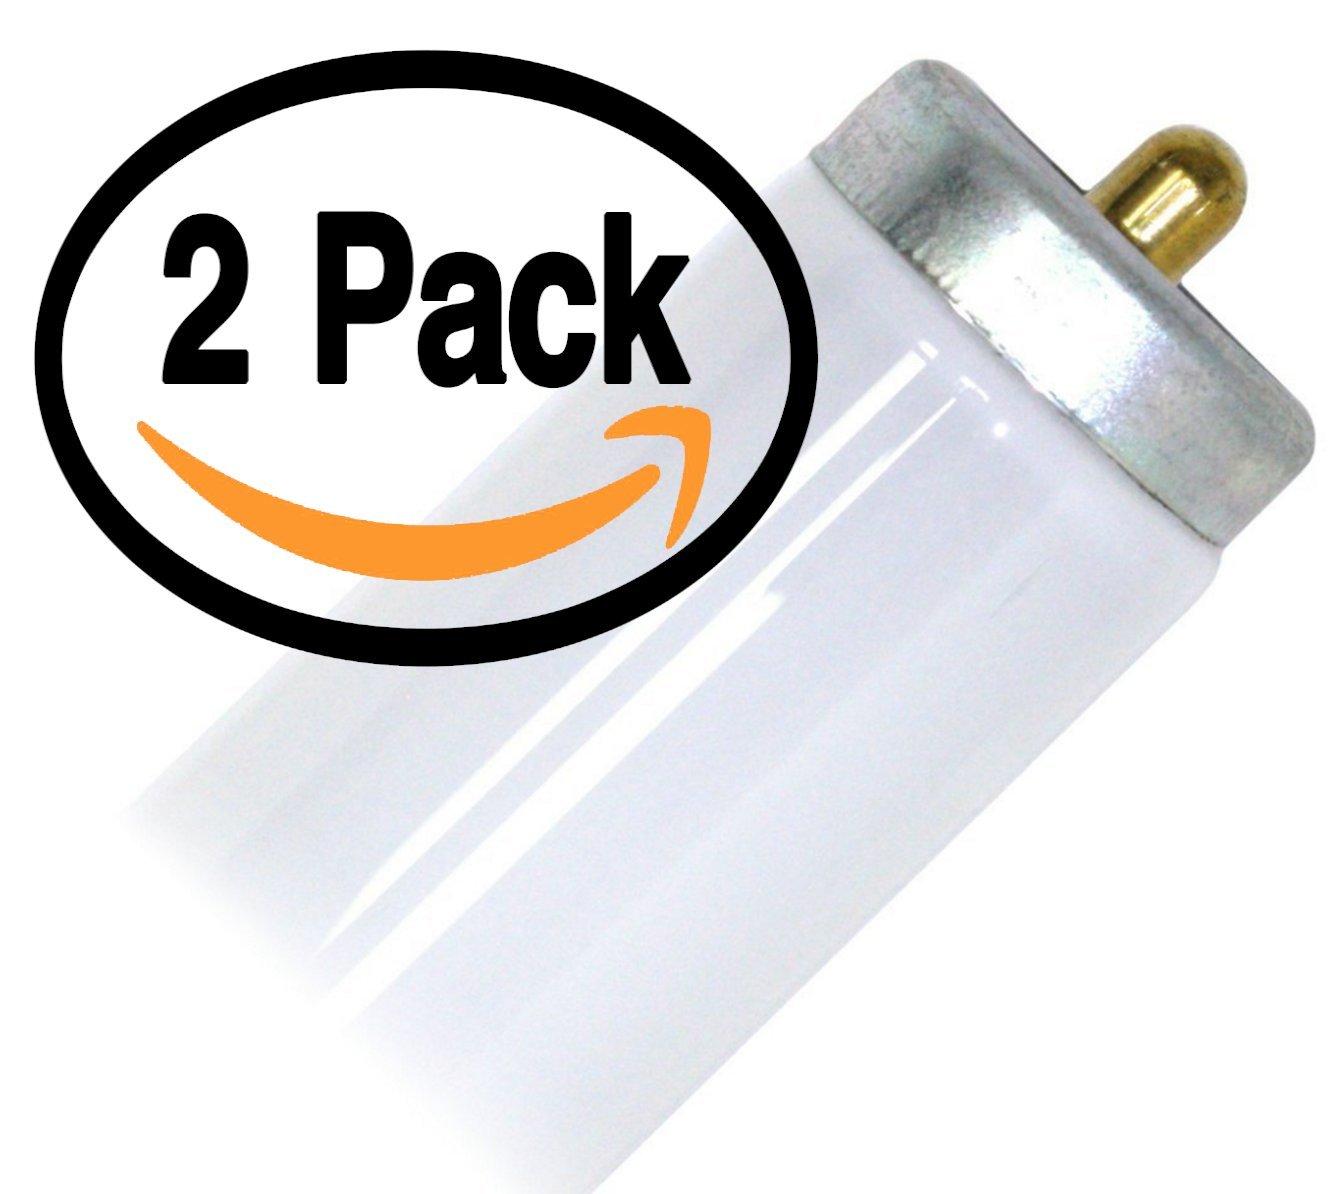 (2 Pack) Sylvania 29478 - F96T12/CWX - Single Pin 75 Watt Straight T12 Fluorescent Tube Light Bulb 75W 4100k Replaces F96T12 F96T12/CW/ECO F96T12/CW Supreme/Alto